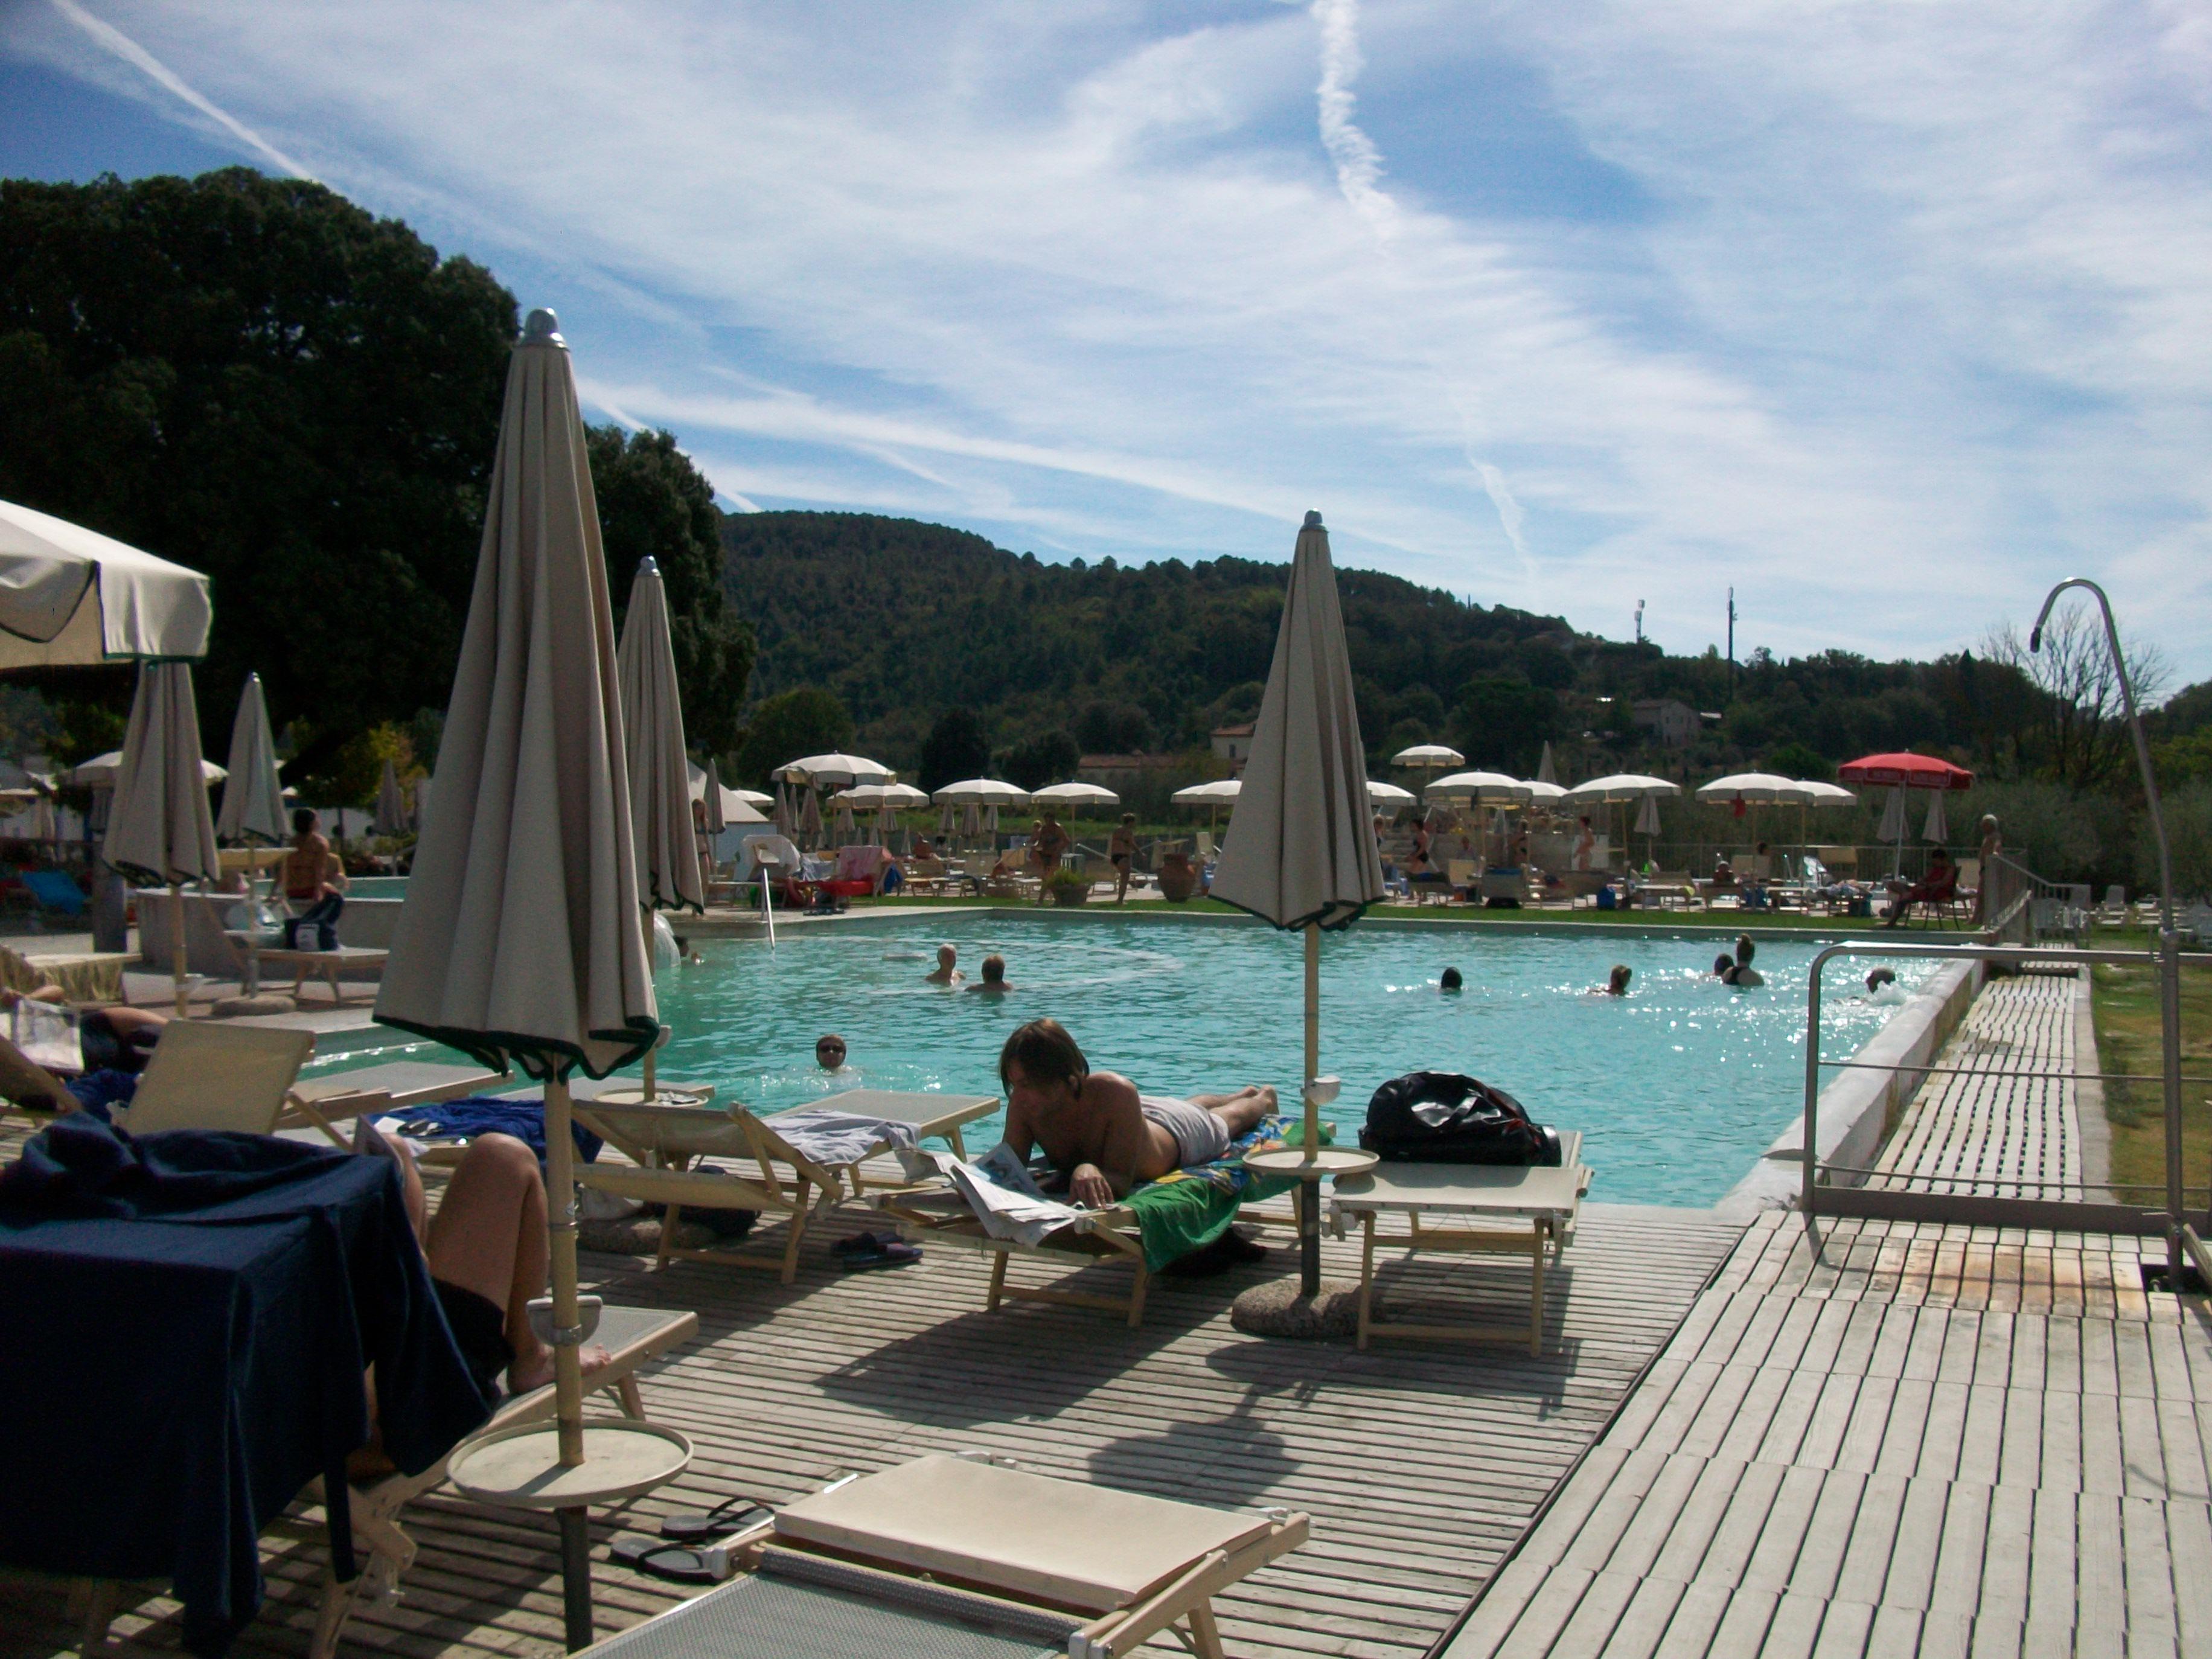 Pool in Therme Spring heaven in the amazing Rapolano terme